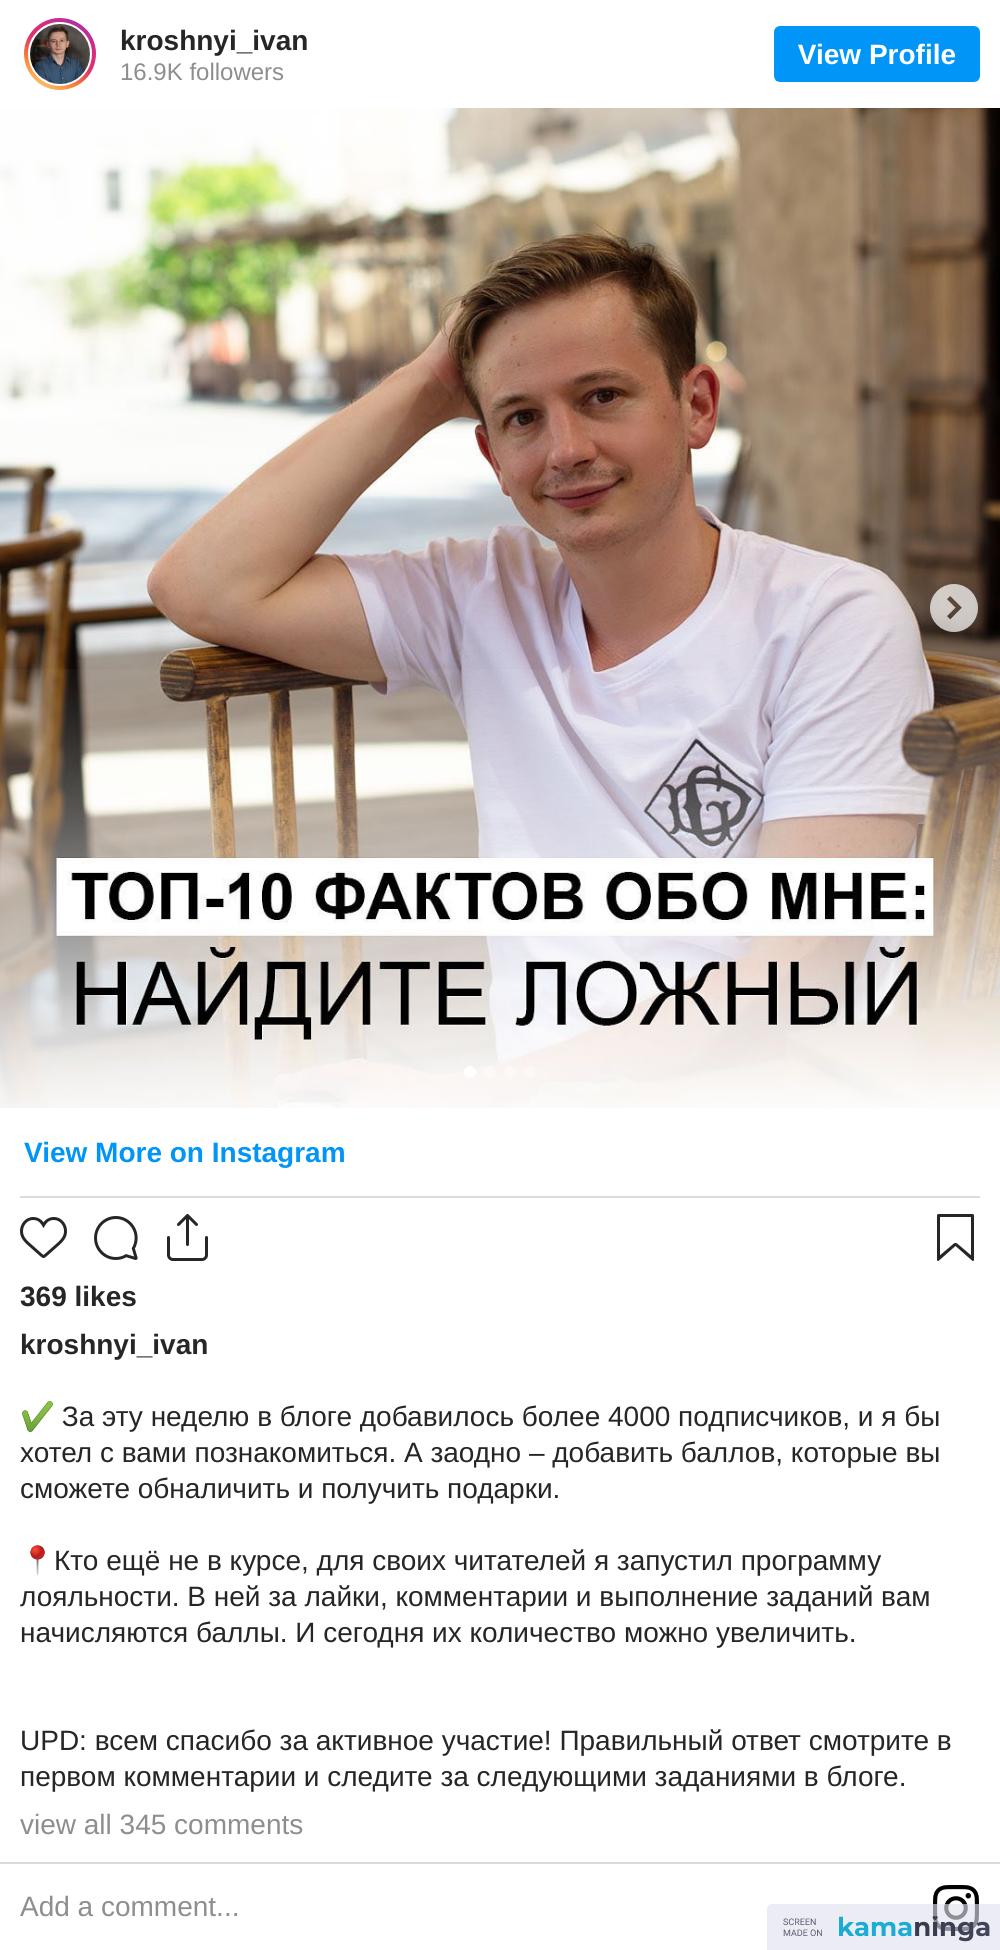 https://www.instagram.com/p/CPsaXoNgjdI/